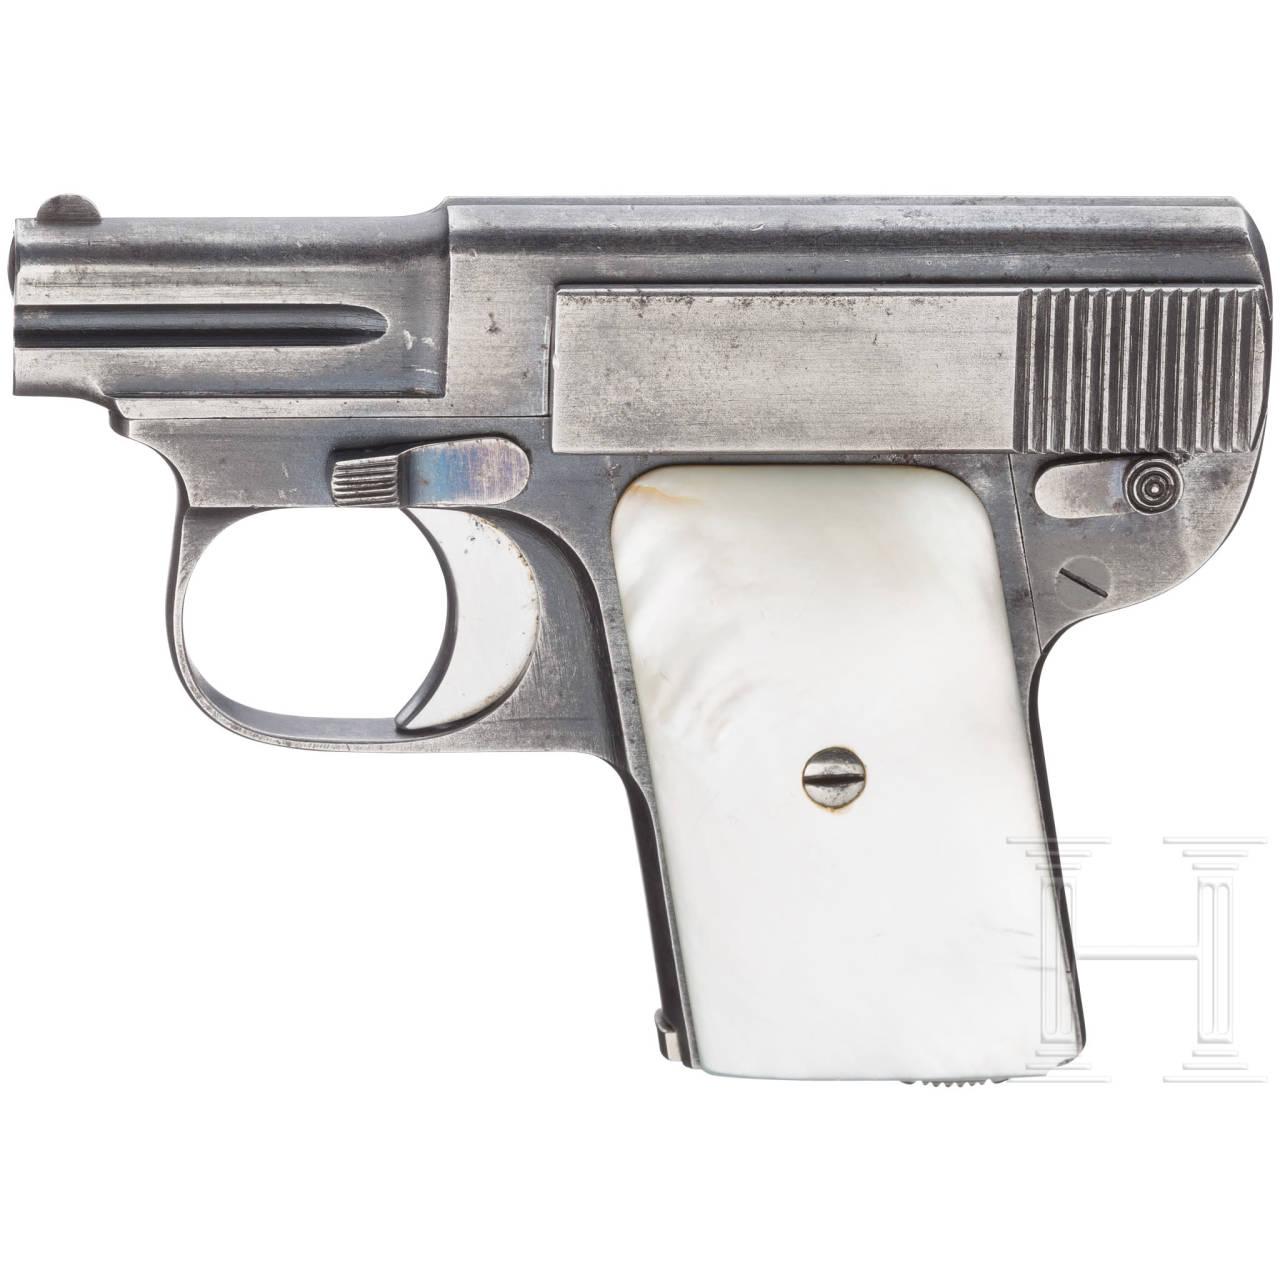 Miniatur-Taschenpistole Gavage